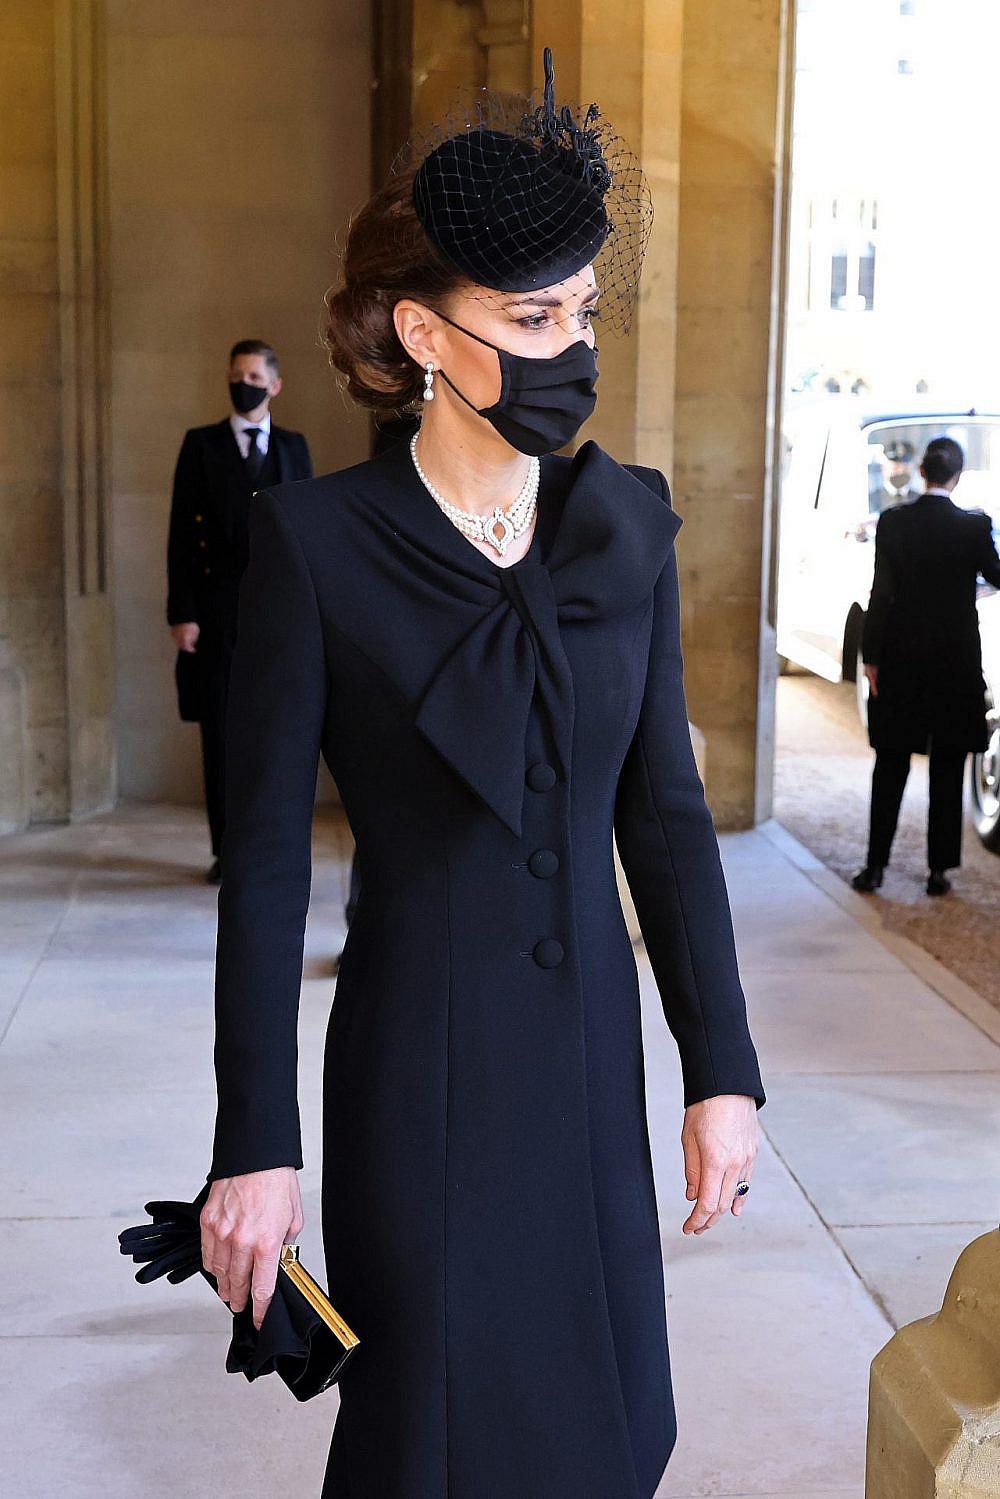 קייט מידלטון בלווית הנסיך פיליפ   צילום: Chris Jackson/WPA Pool/Getty Images